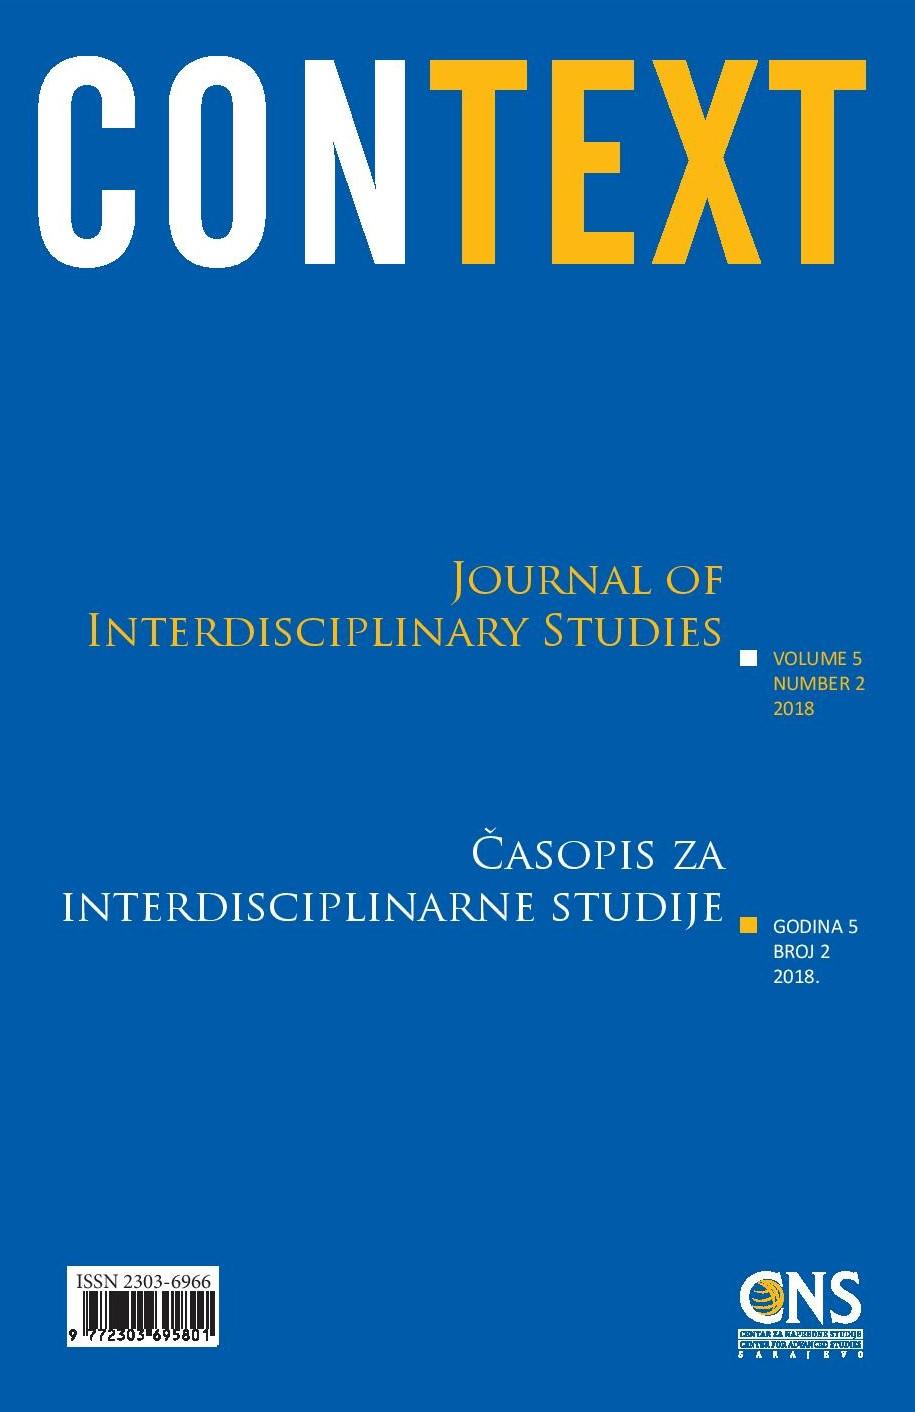 View Vol. 5 No. 2 (2018): Context: Journal of Interdisciplinary Studies